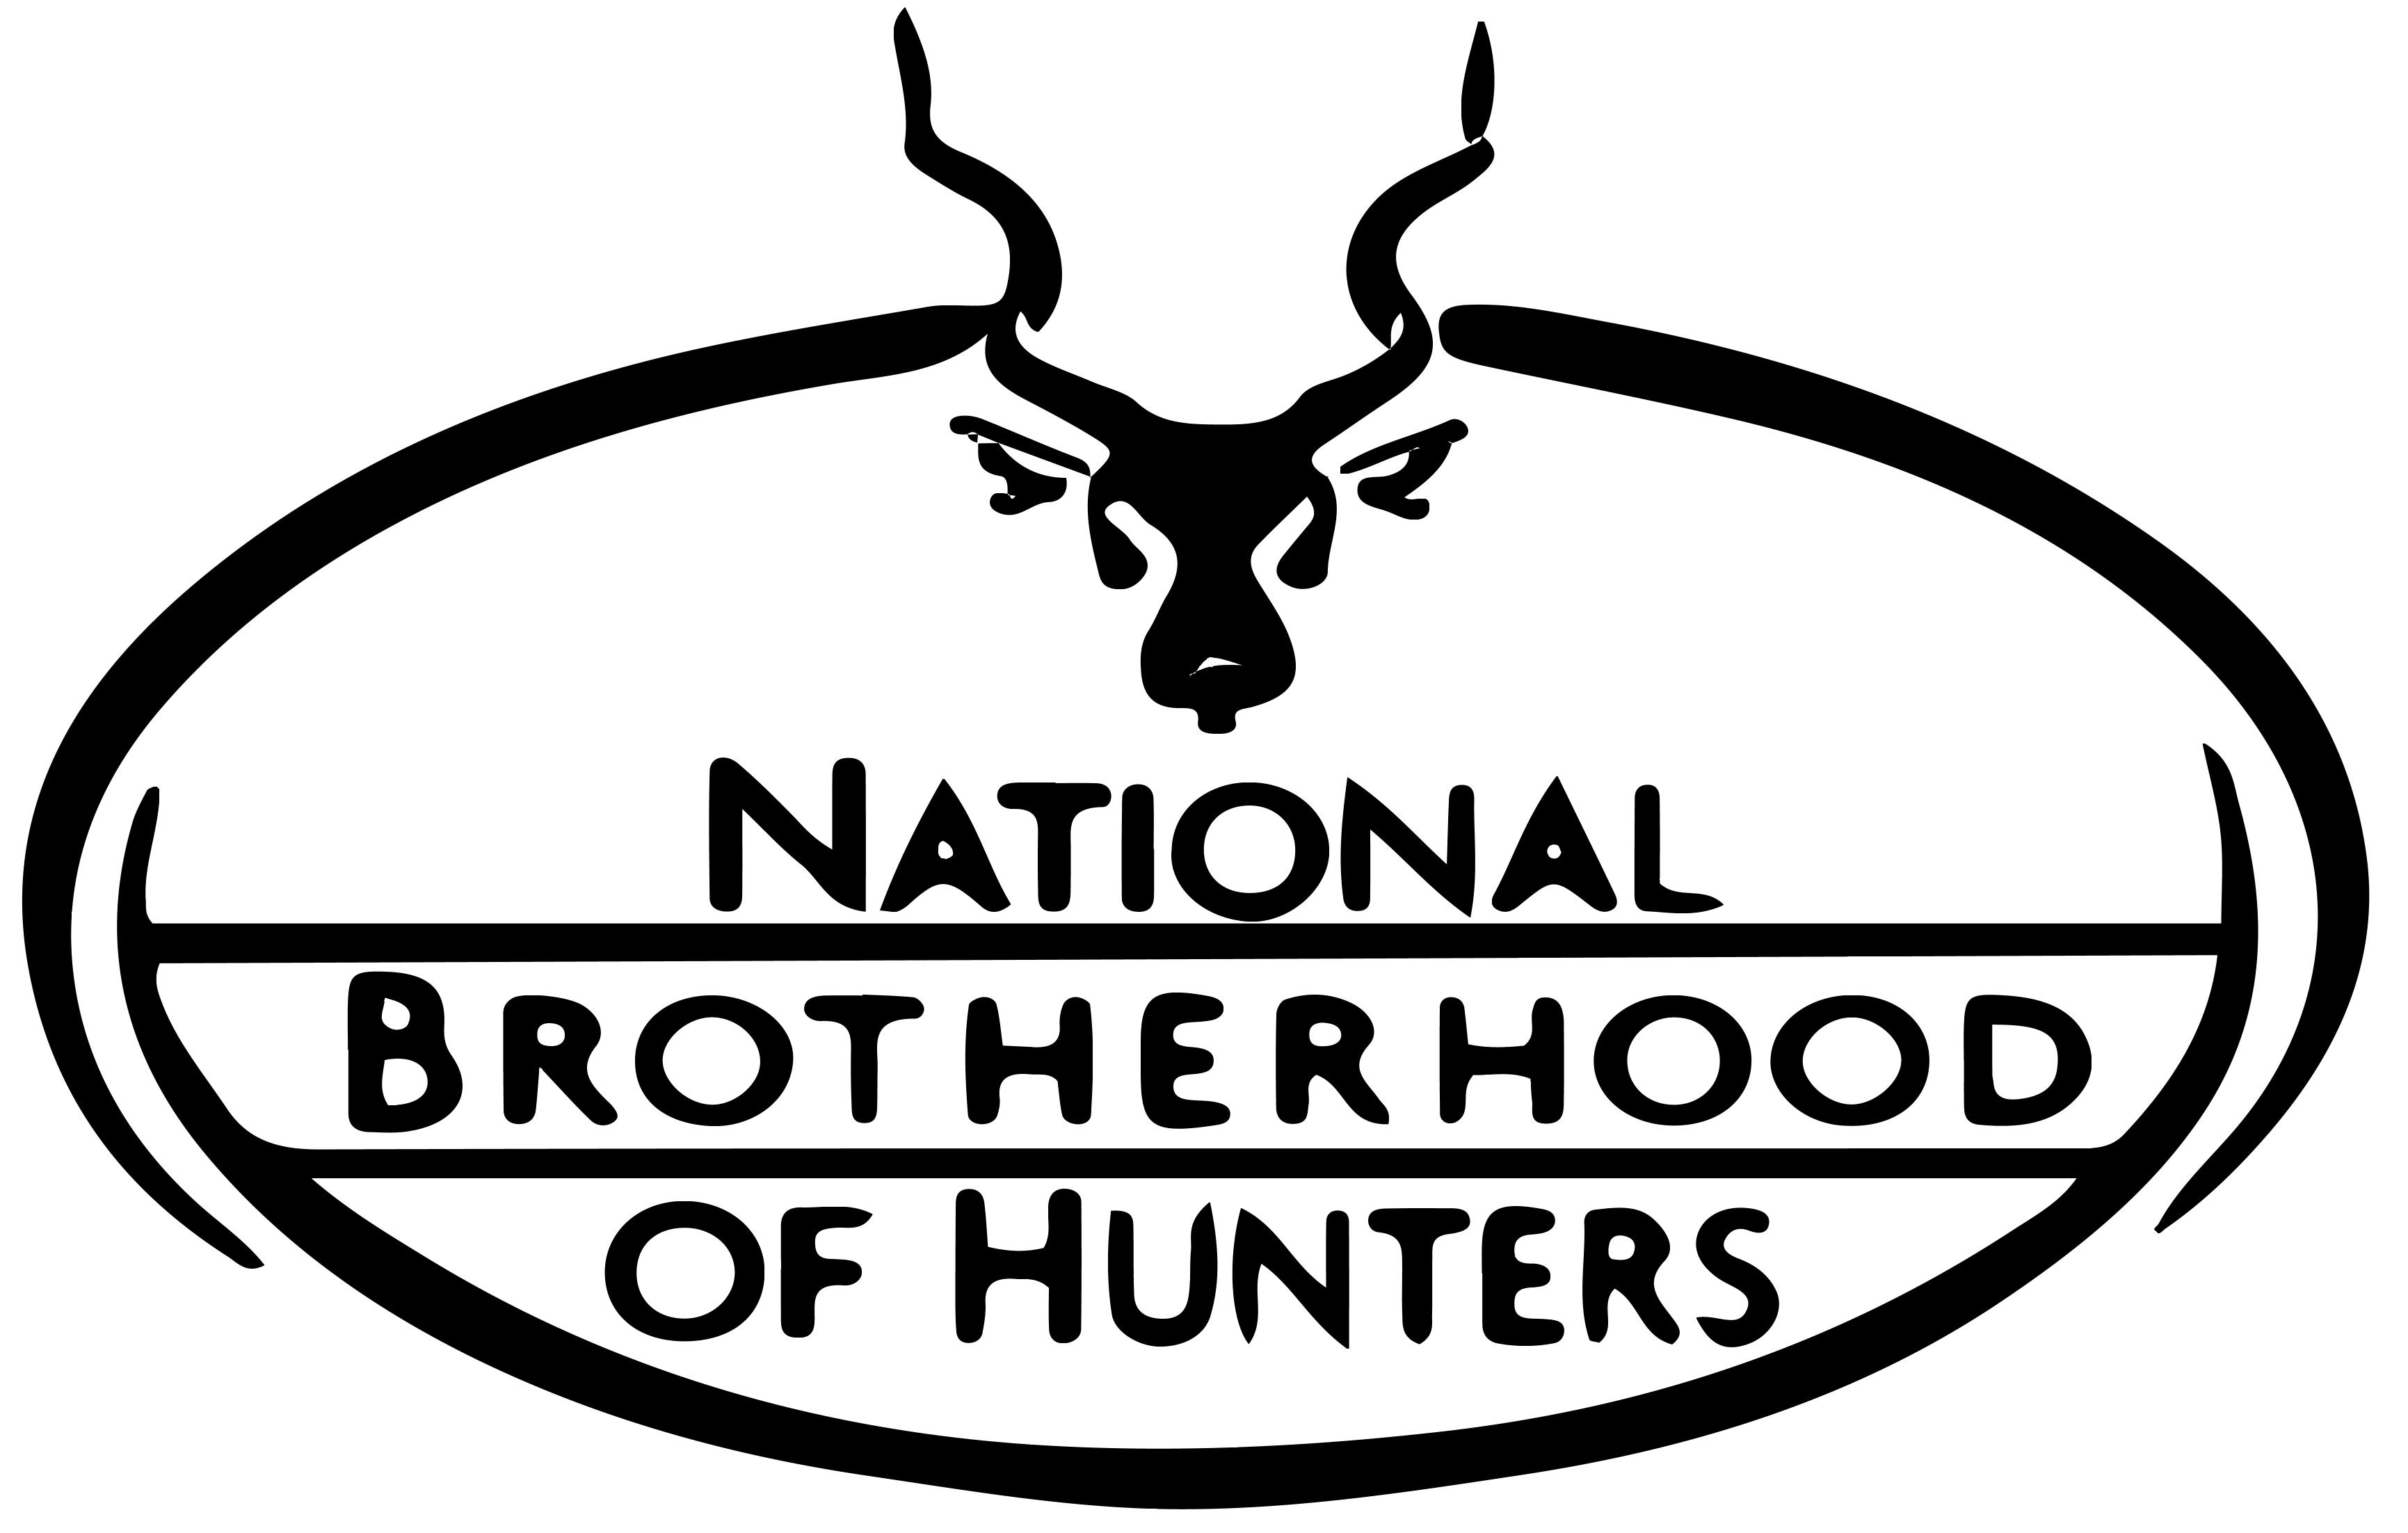 Hunting clipart woman hunter. National brotherhood of hunters